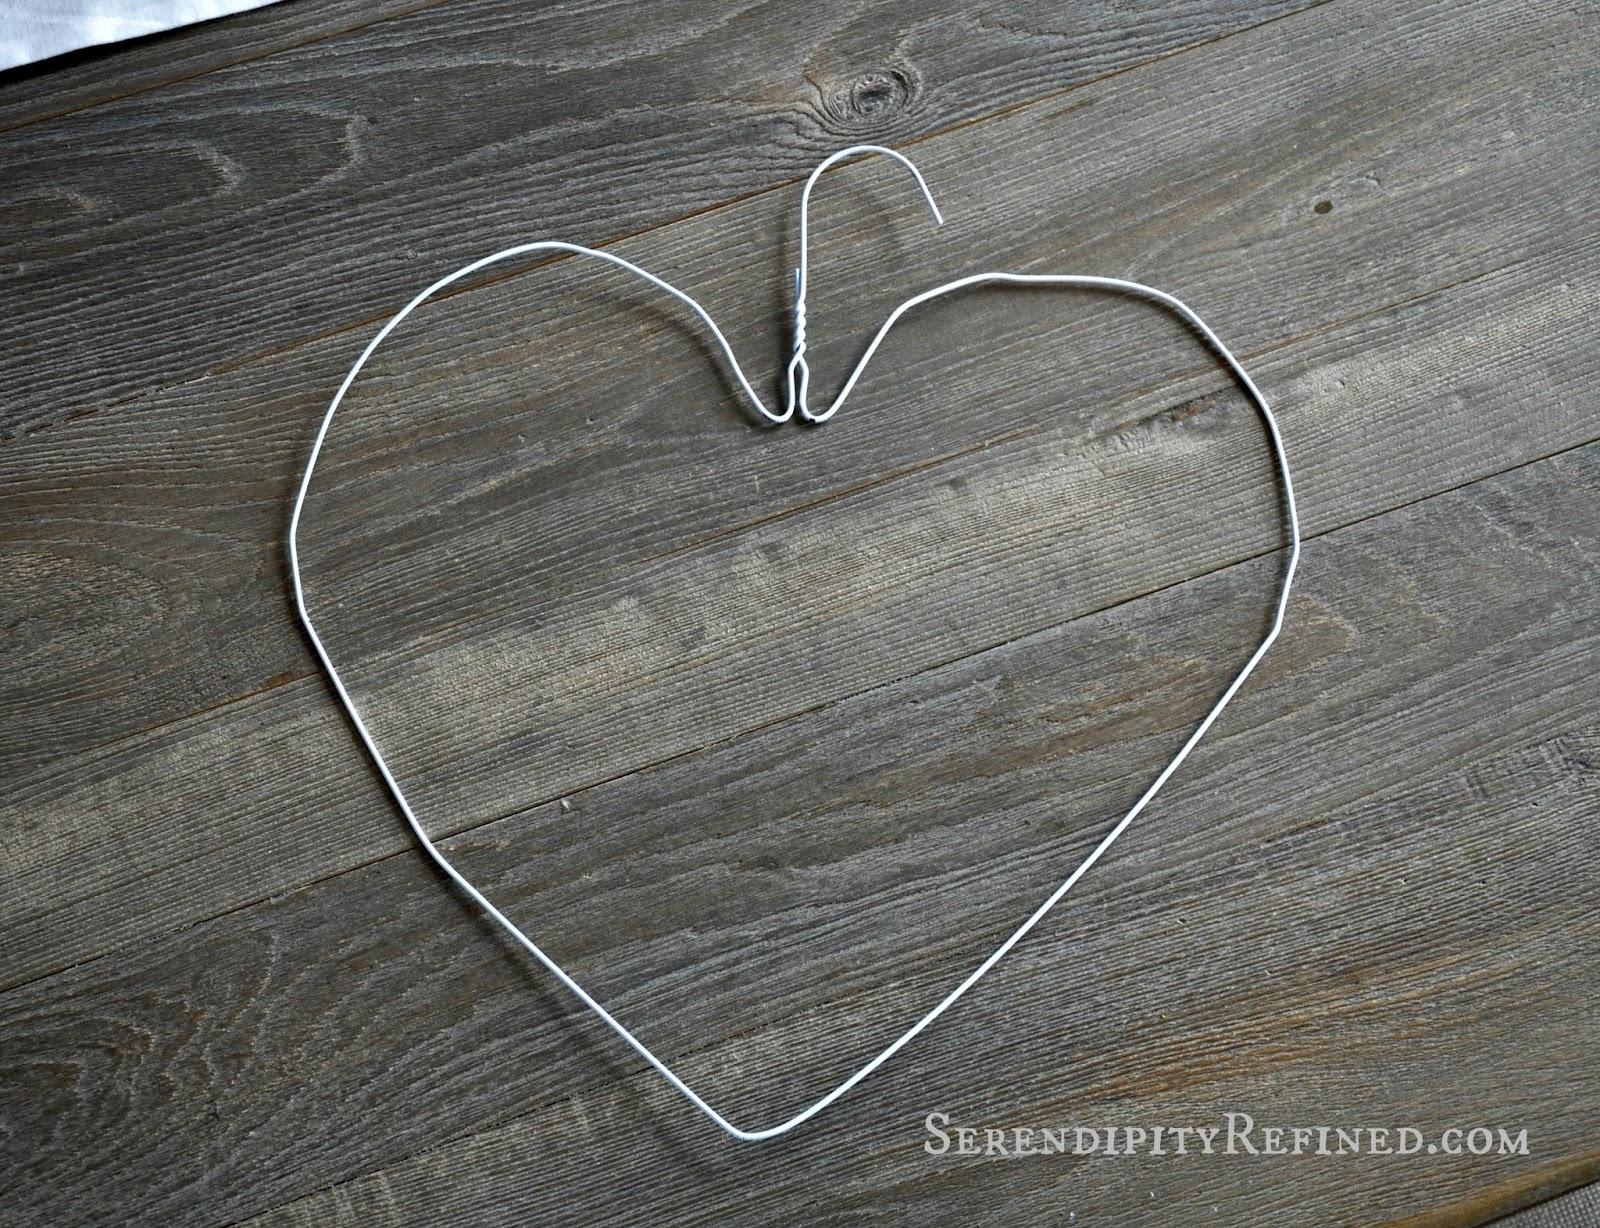 Serendipity Refined Blog: DIY Heart Shaped Flower Wreath Tutorial